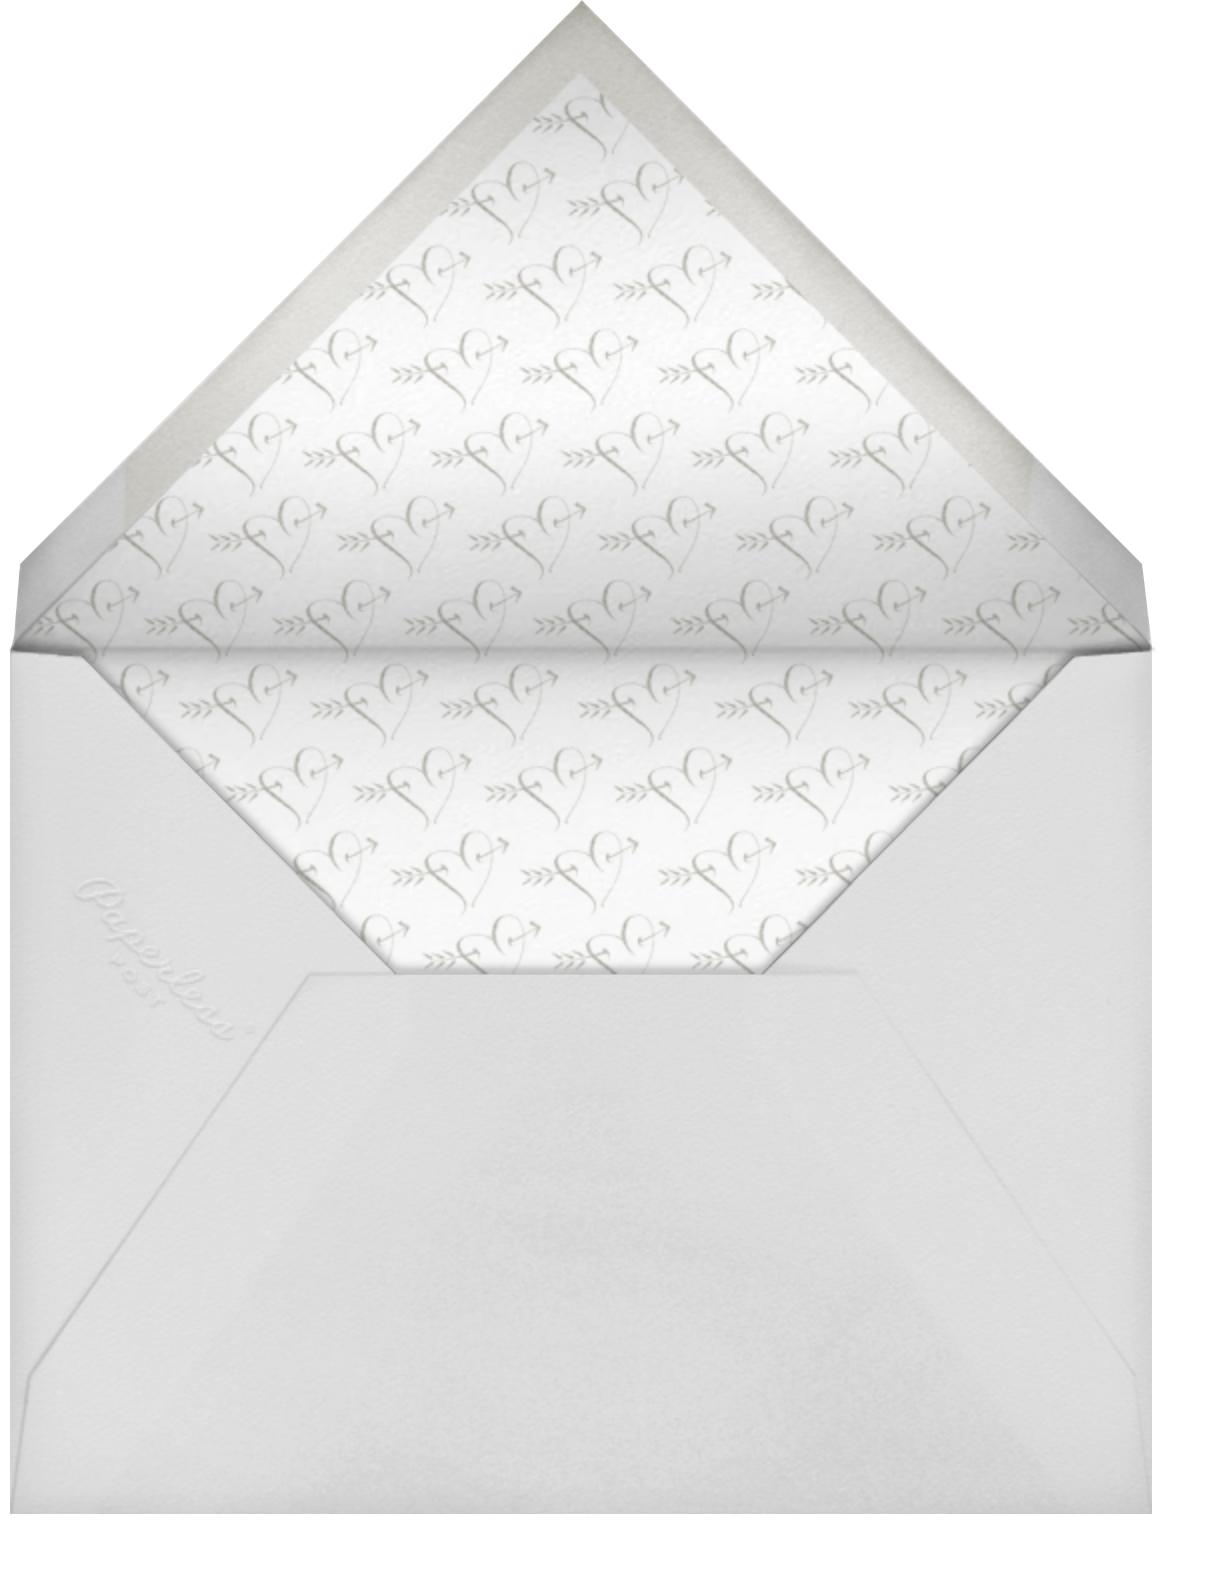 Save The Date Flourish - Gray - Bernard Maisner - Party save the dates - envelope back